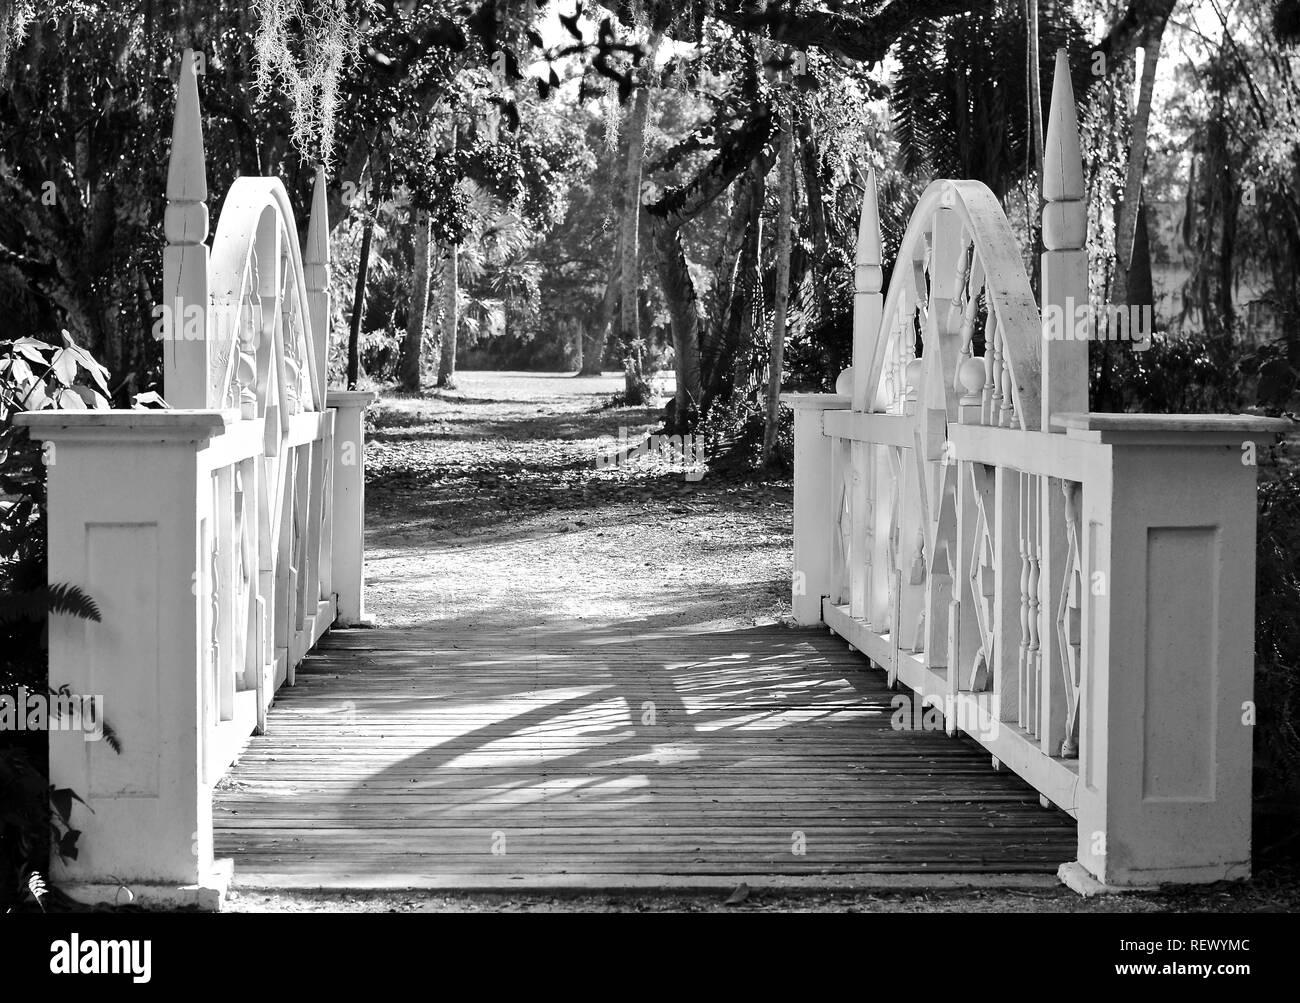 nature, footbridge, park, bridge, landscape, wood, tree, wooden, outdoor, scenic, landmark, vintage, old, beautiful, decorative, tourism, scenic lands - Stock Image